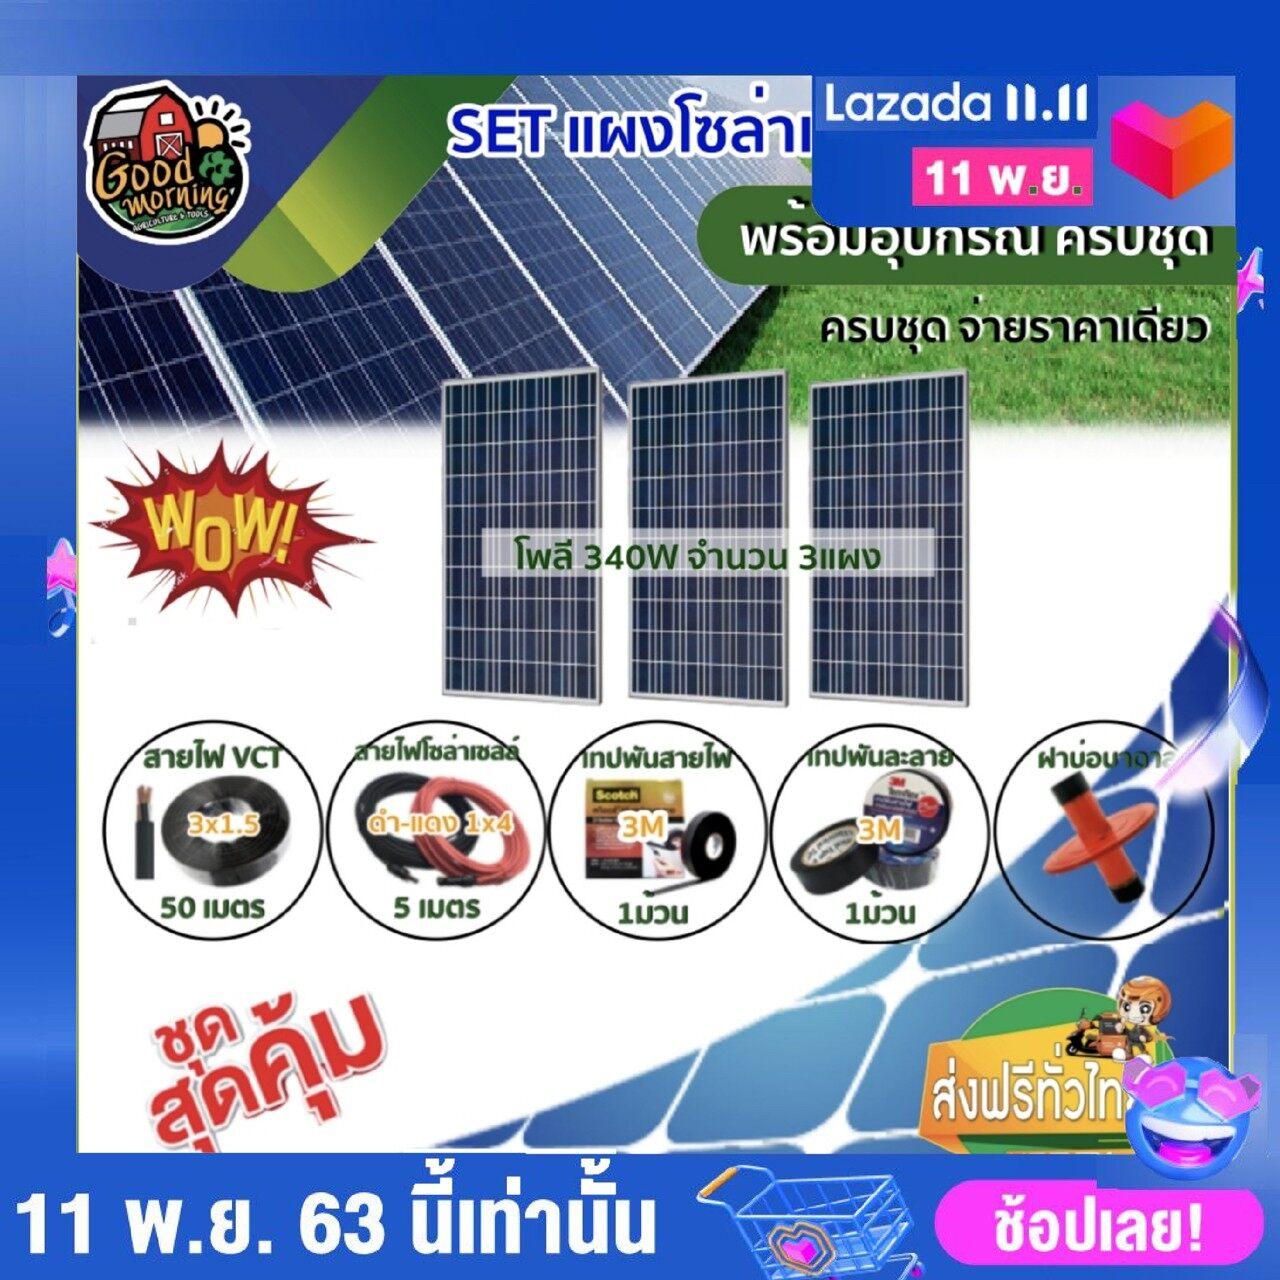 SET แผงโซล่าเซลล์ โพลี 340W 3แผง พร้อมอุปกรณ์ สายไฟ VCT 3x1.5 50M. / สายไฟโซล่าเซลล์ ดำ-แดง 1x4 5M. /เทปพันสายไฟ 3M / เทปพันละลาย 3M /ฝาบ่อบาดาล SOLARCELL POLY ส่งฟรีทั่วไทย เก็บเงินปลายทาง